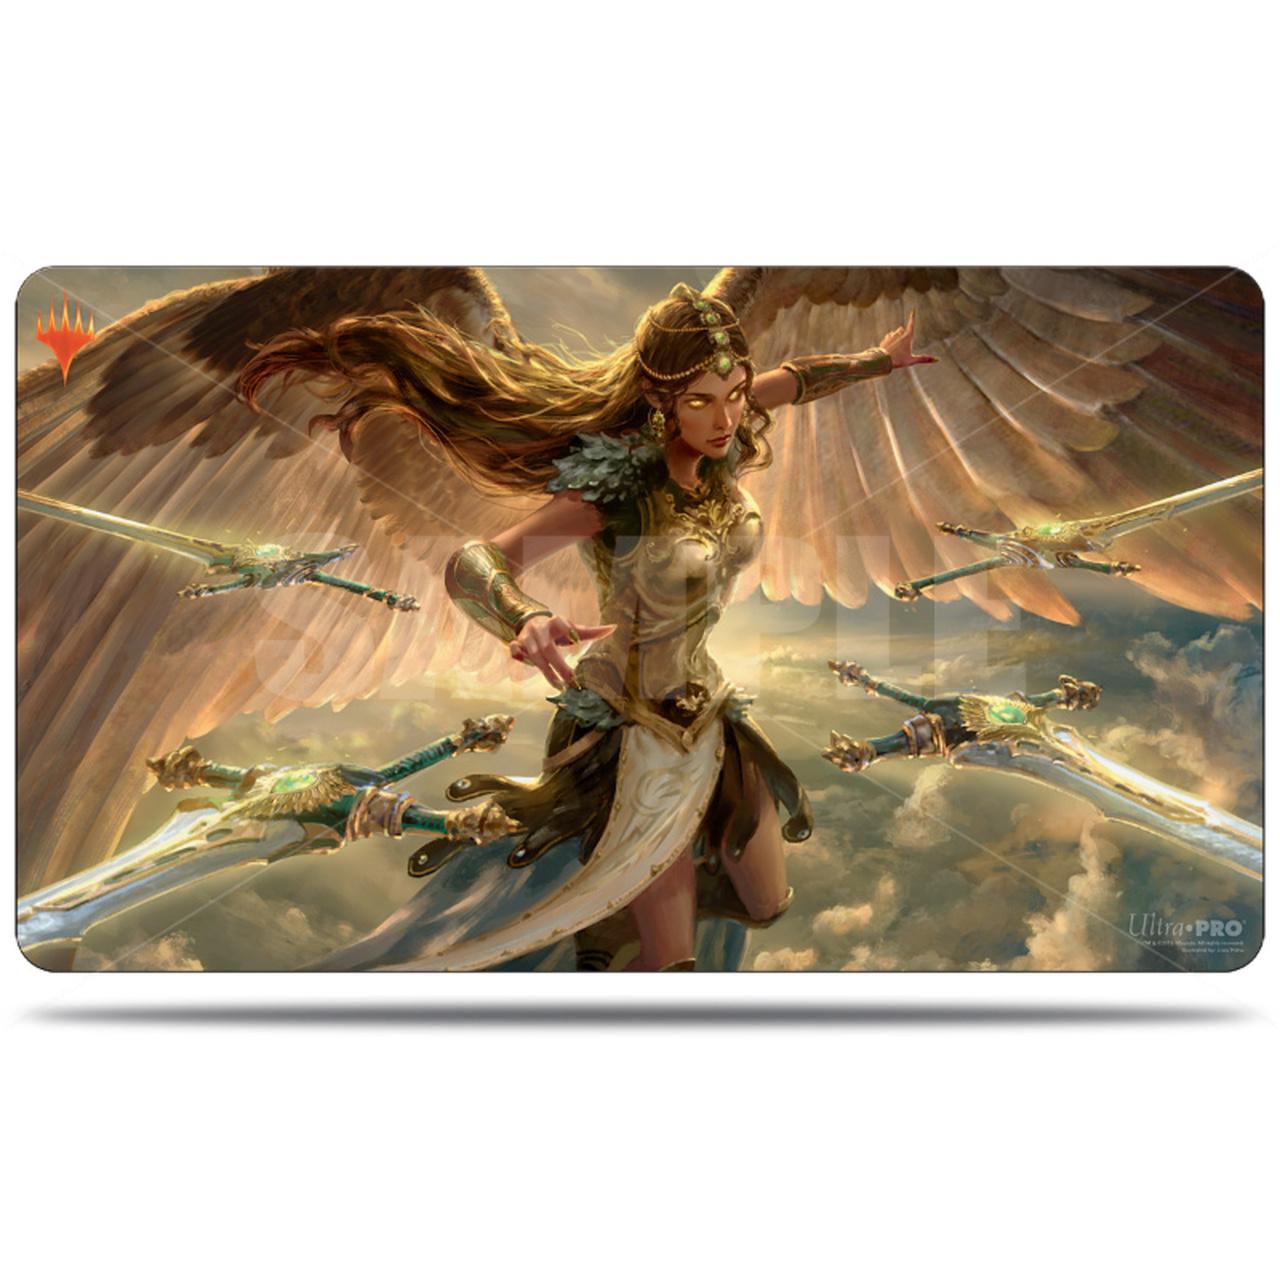 Ultra Pro - MTG Core Set 2020 - Sephara, Skys Blade Playmat